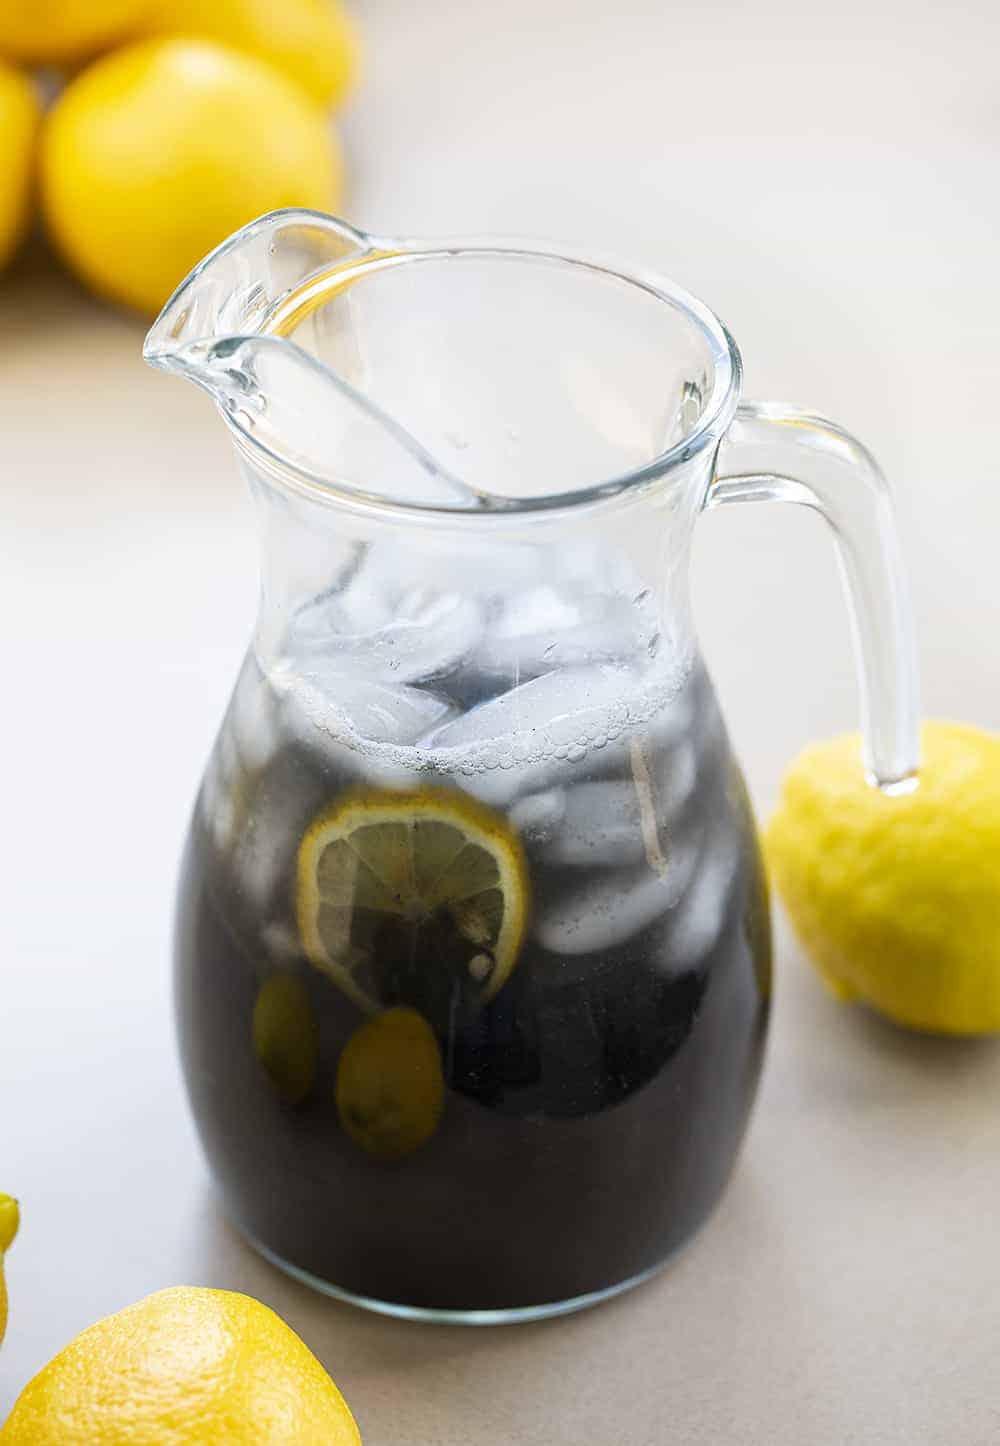 Pitcher of Charcoal Lemonade with Lemons